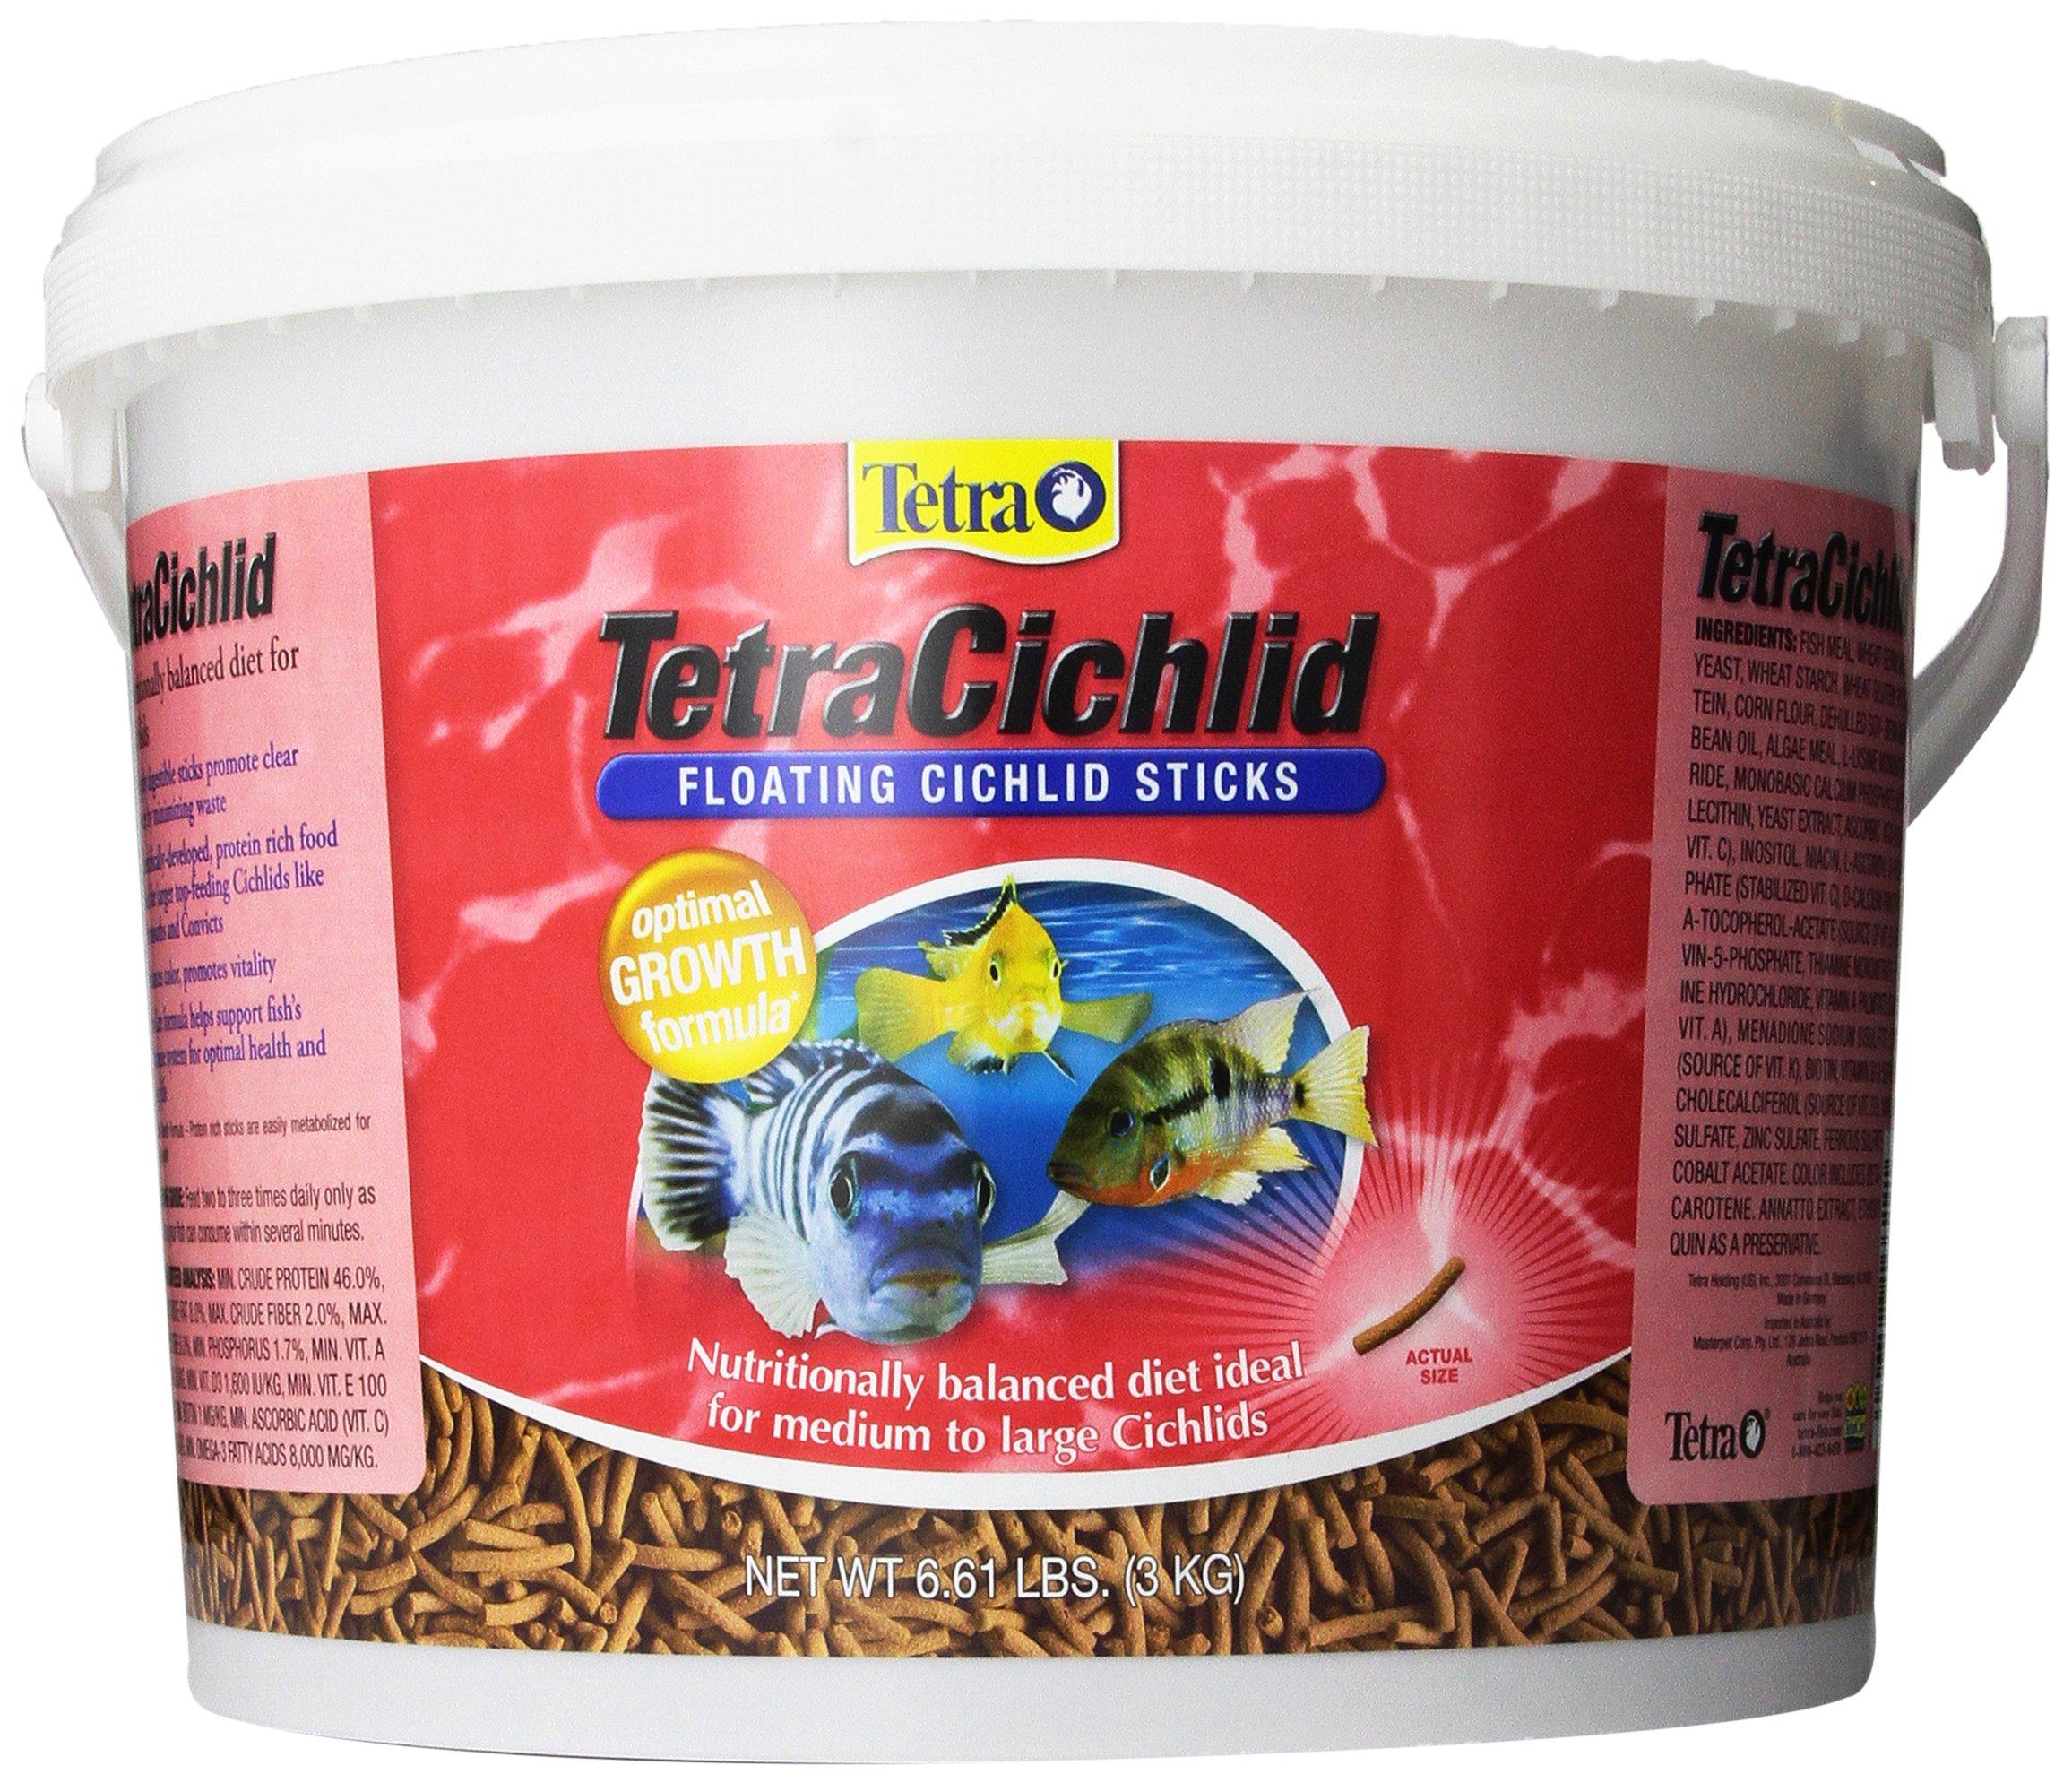 TetraCichlid Floating Cichlid Sticks, Pond Fish Food, Nutritionally Balanced by Tetra